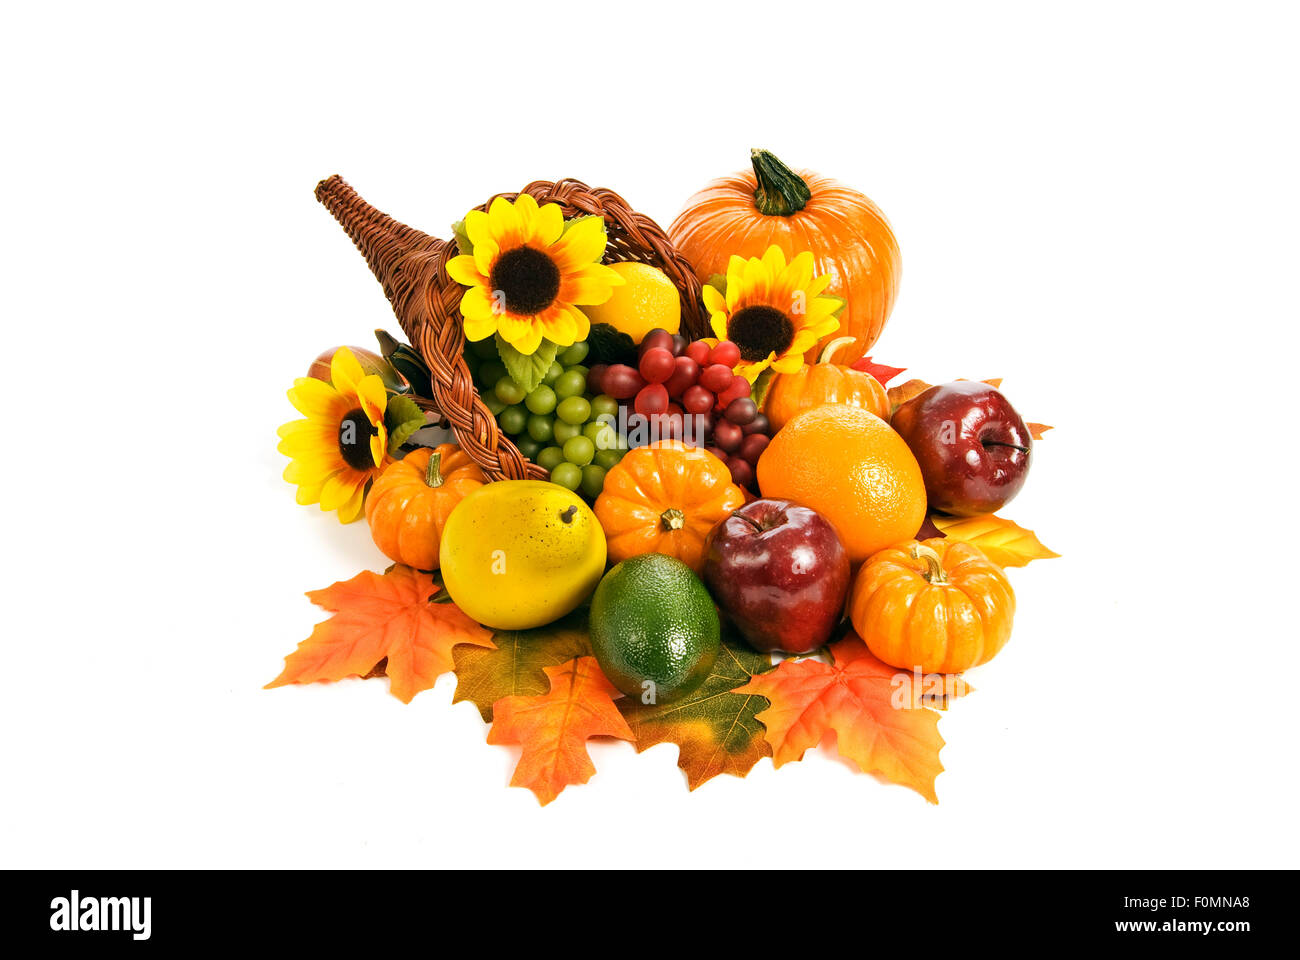 Beautiful and brightly colored fall cornucopia centerpiece arrangement - Stock Image